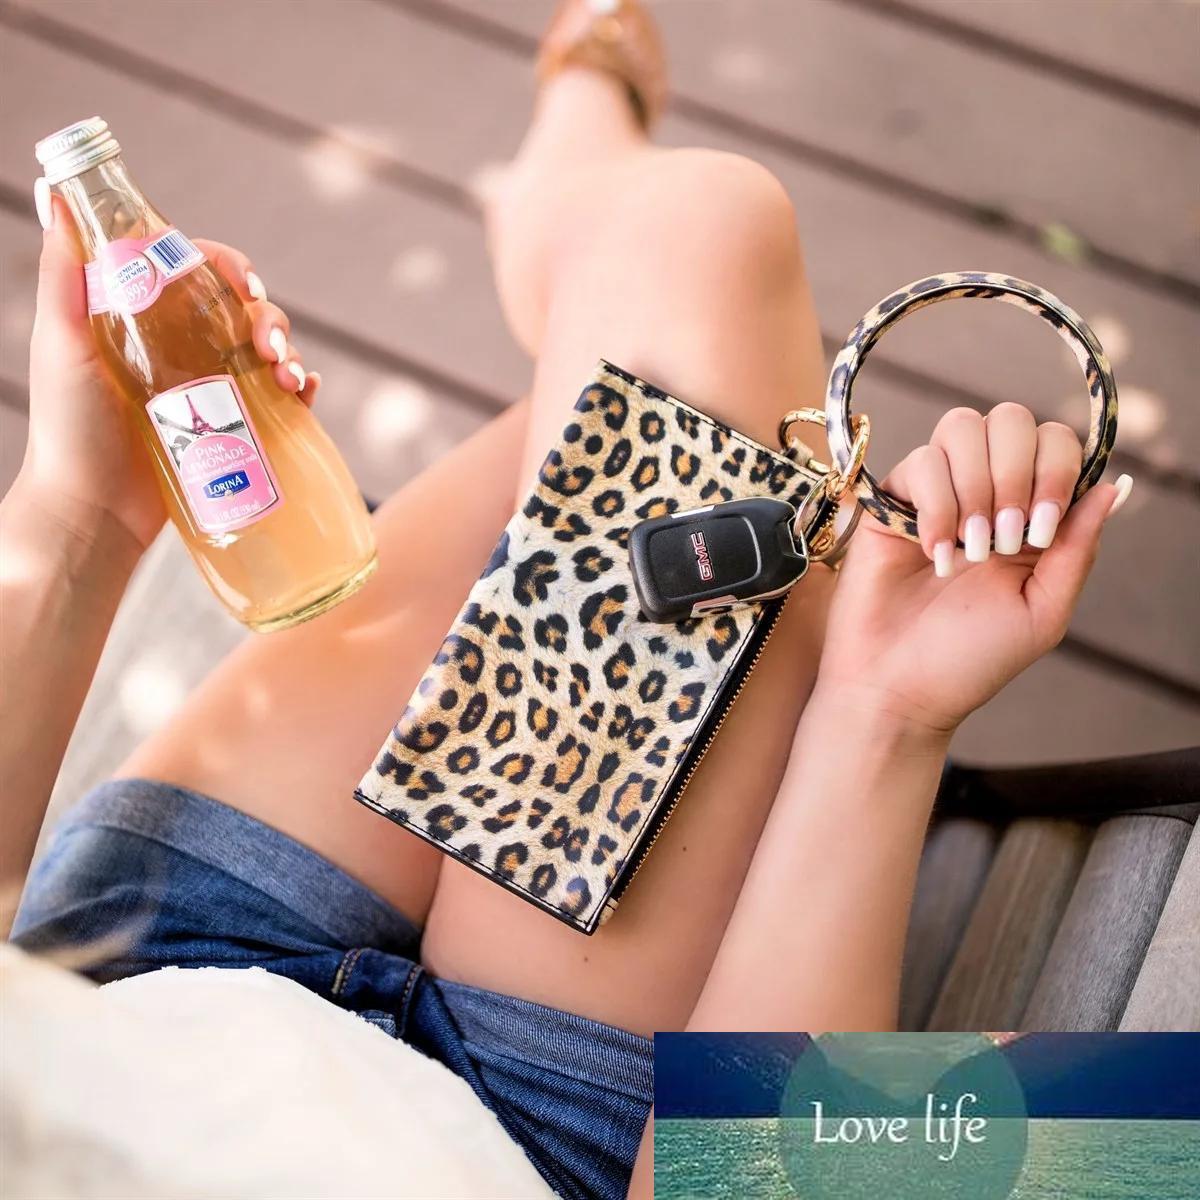 2020 Accessories Oversized Leopard O Bracelet Keyring Shopping Bag Wallet Wristlet Leather Keychain Bangle Key Ring For Women